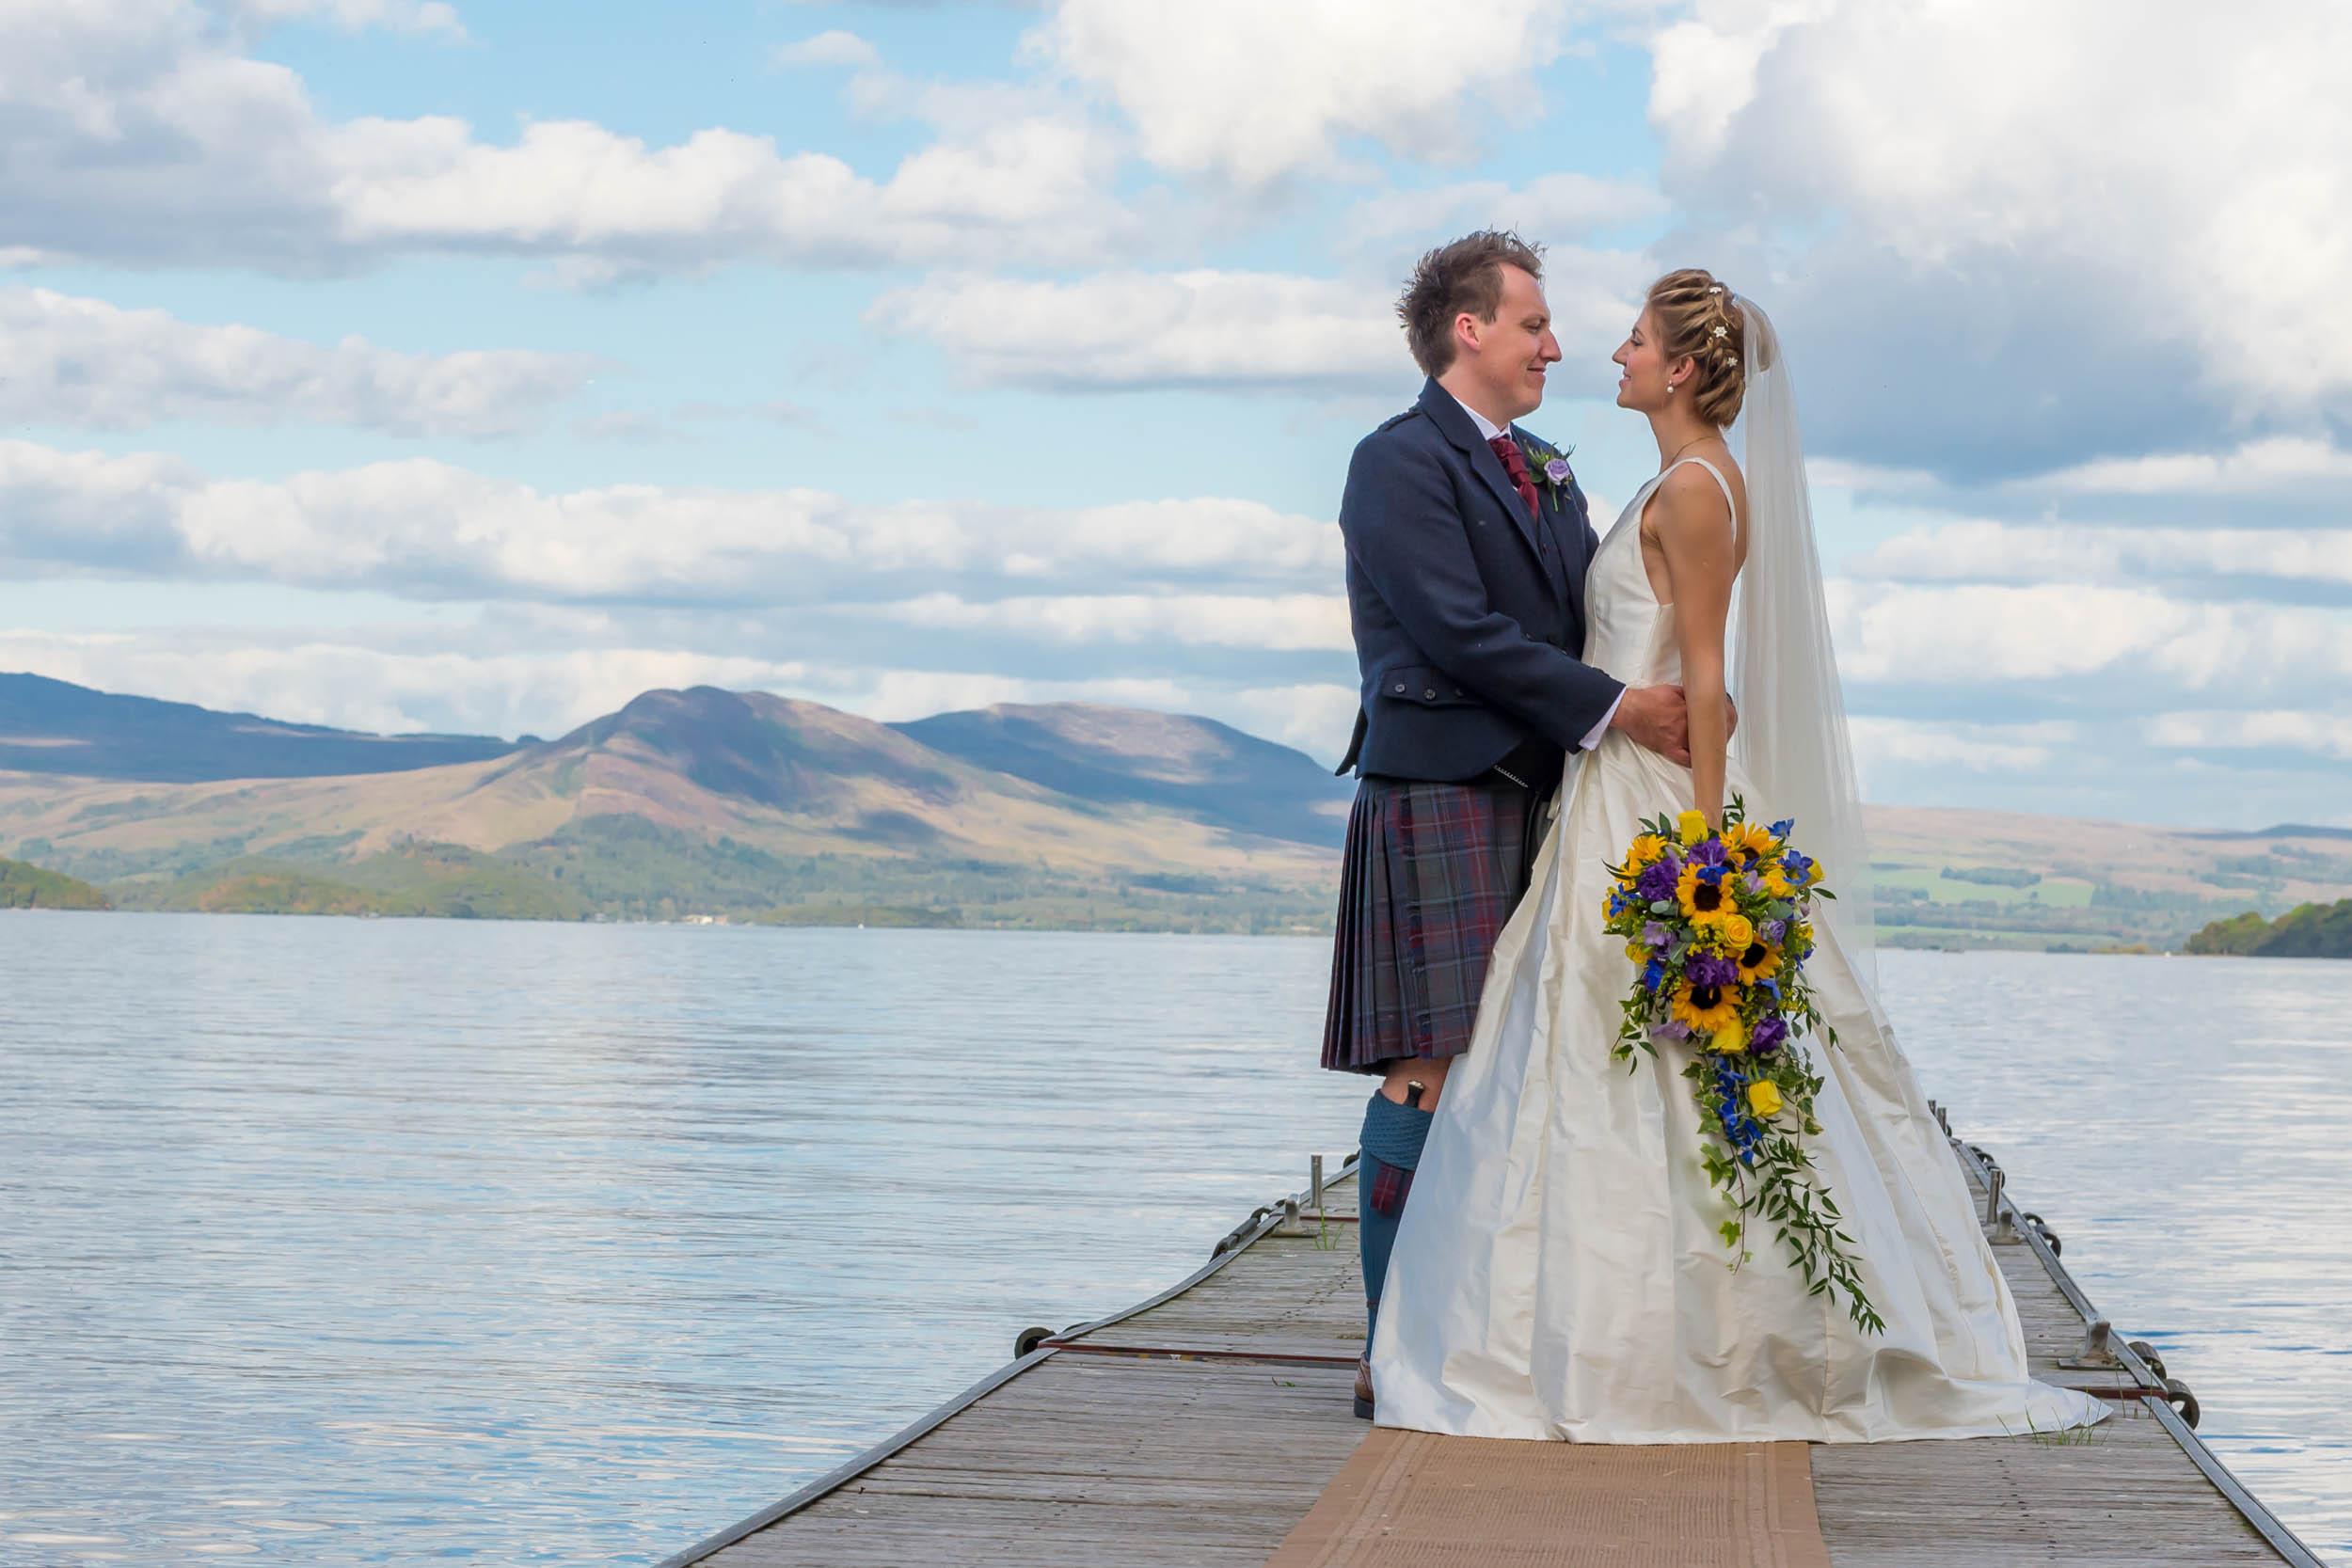 Weddings-Paul-Saunders-Photography-6523.jpg